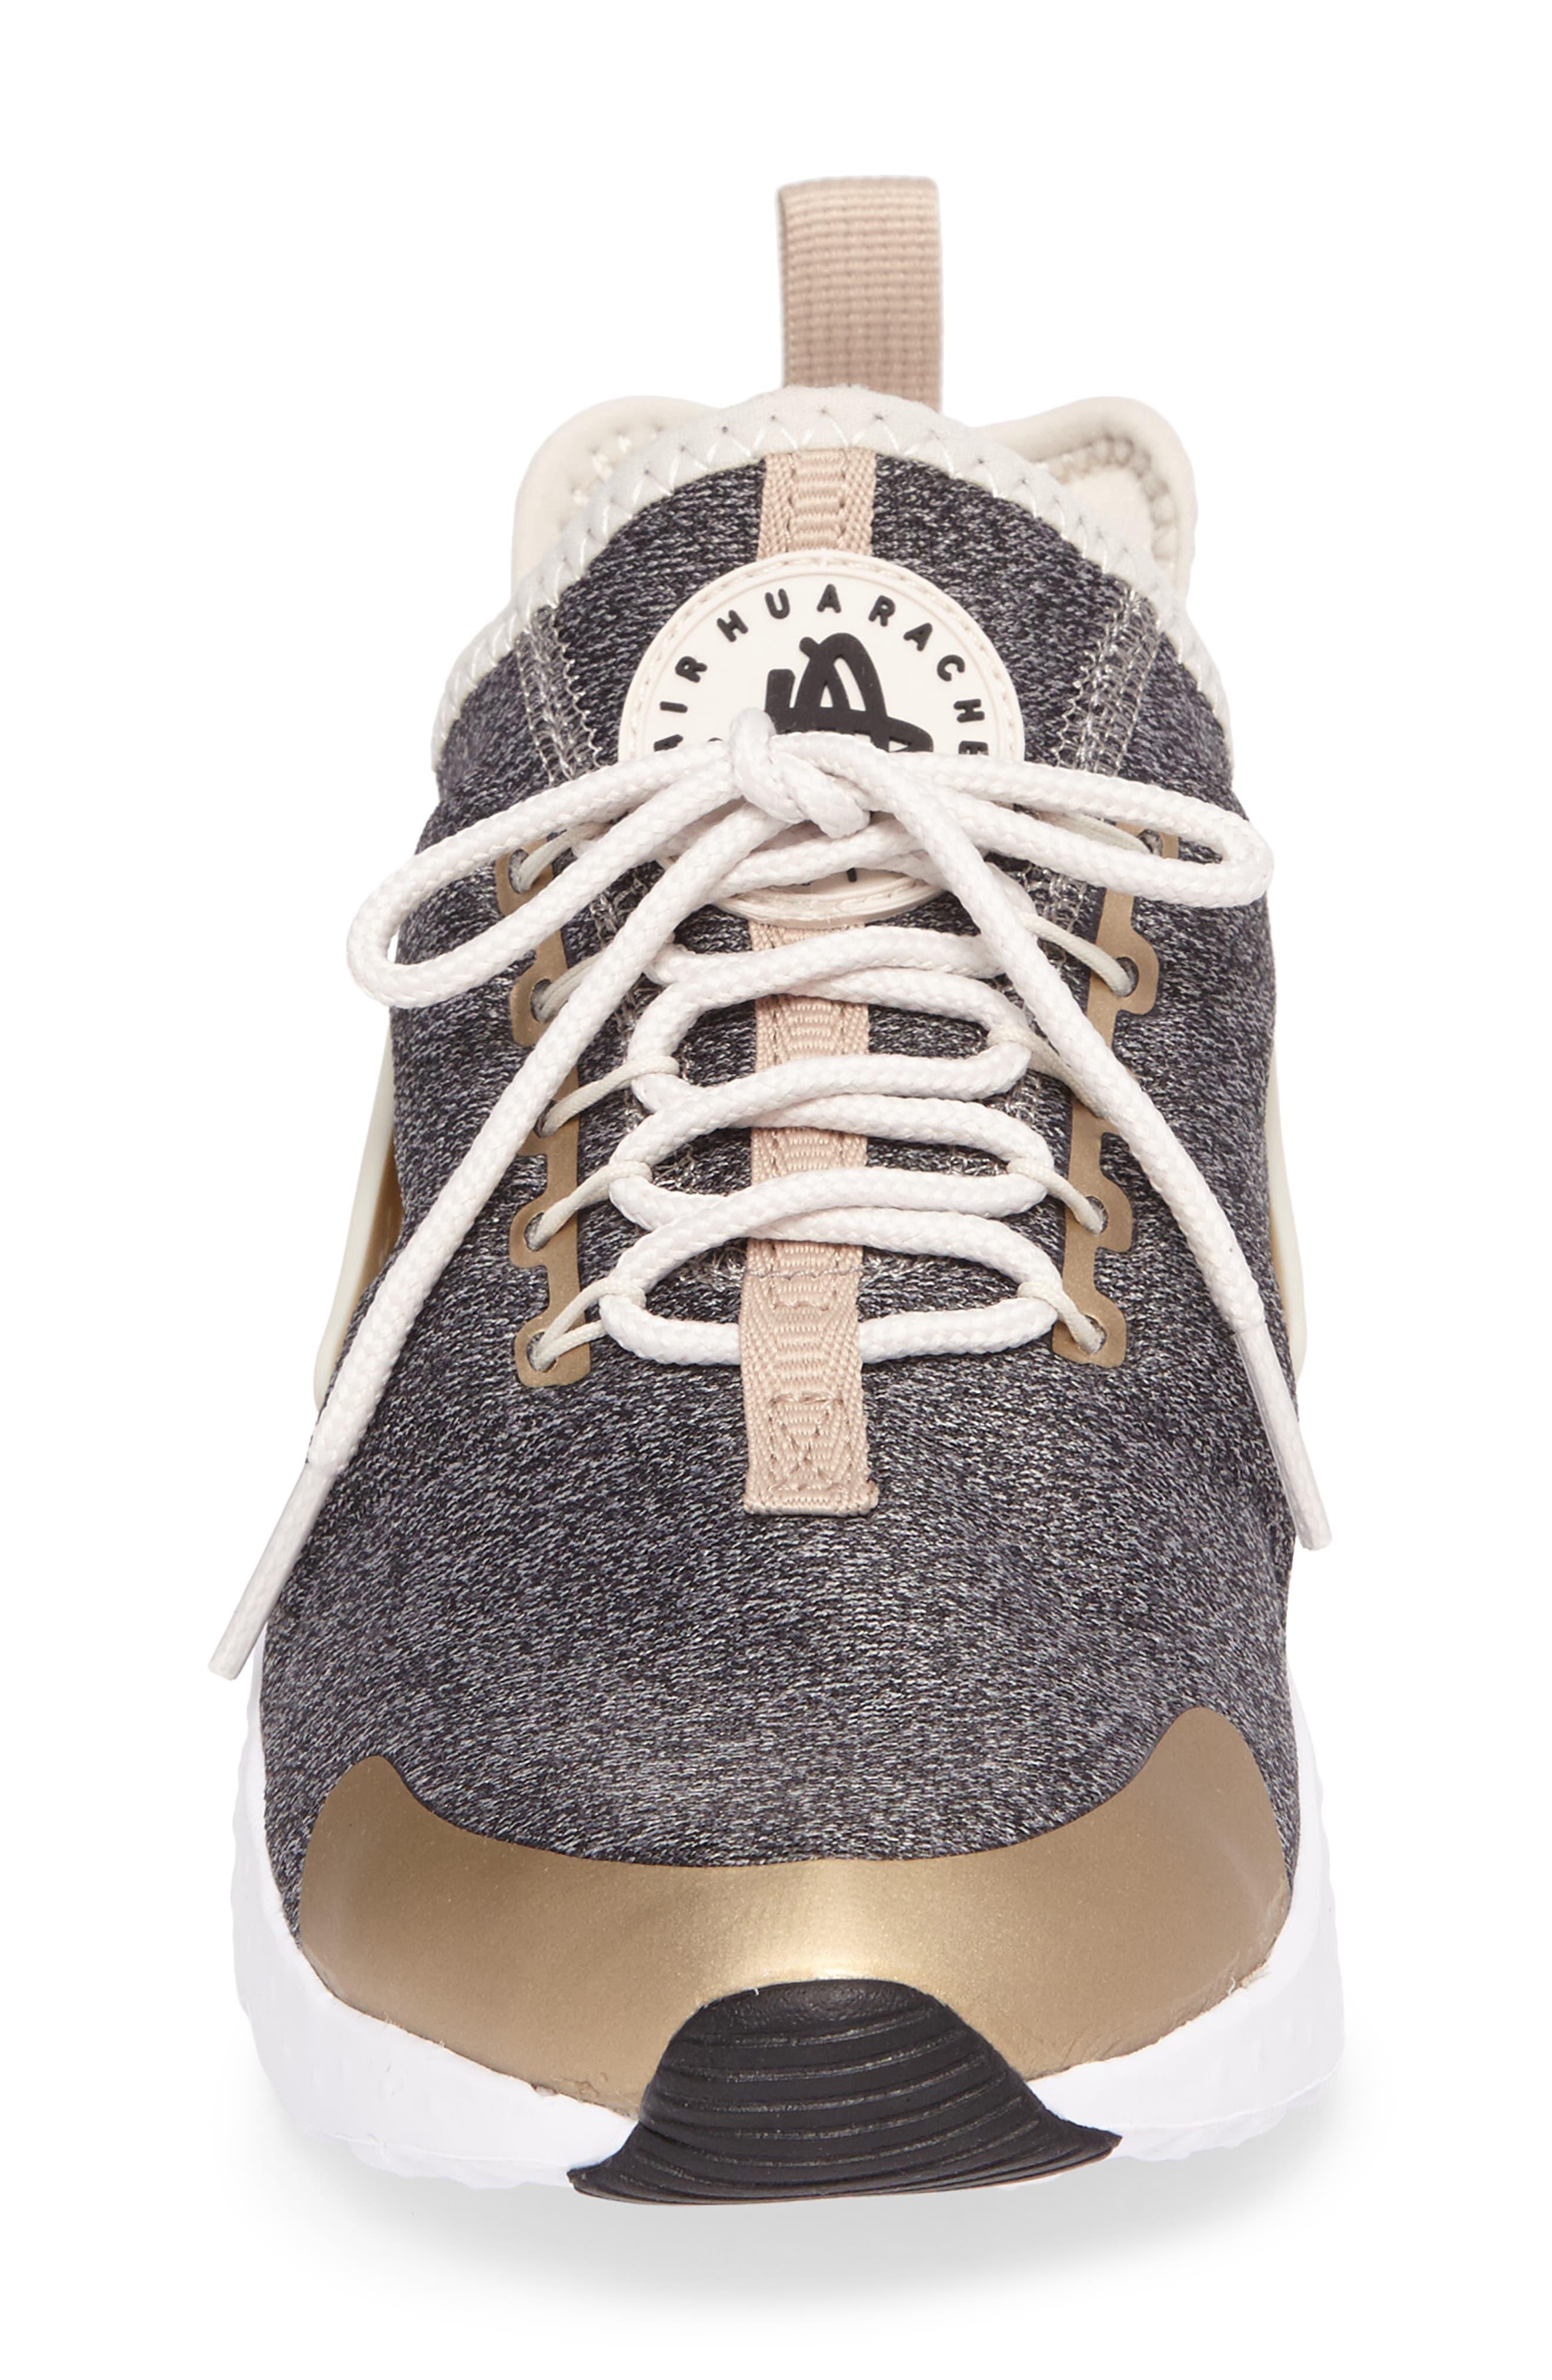 NIKE,                             'Air Huarache Run Ultra SE' Sneaker,                             Alternate thumbnail 4, color,                             285